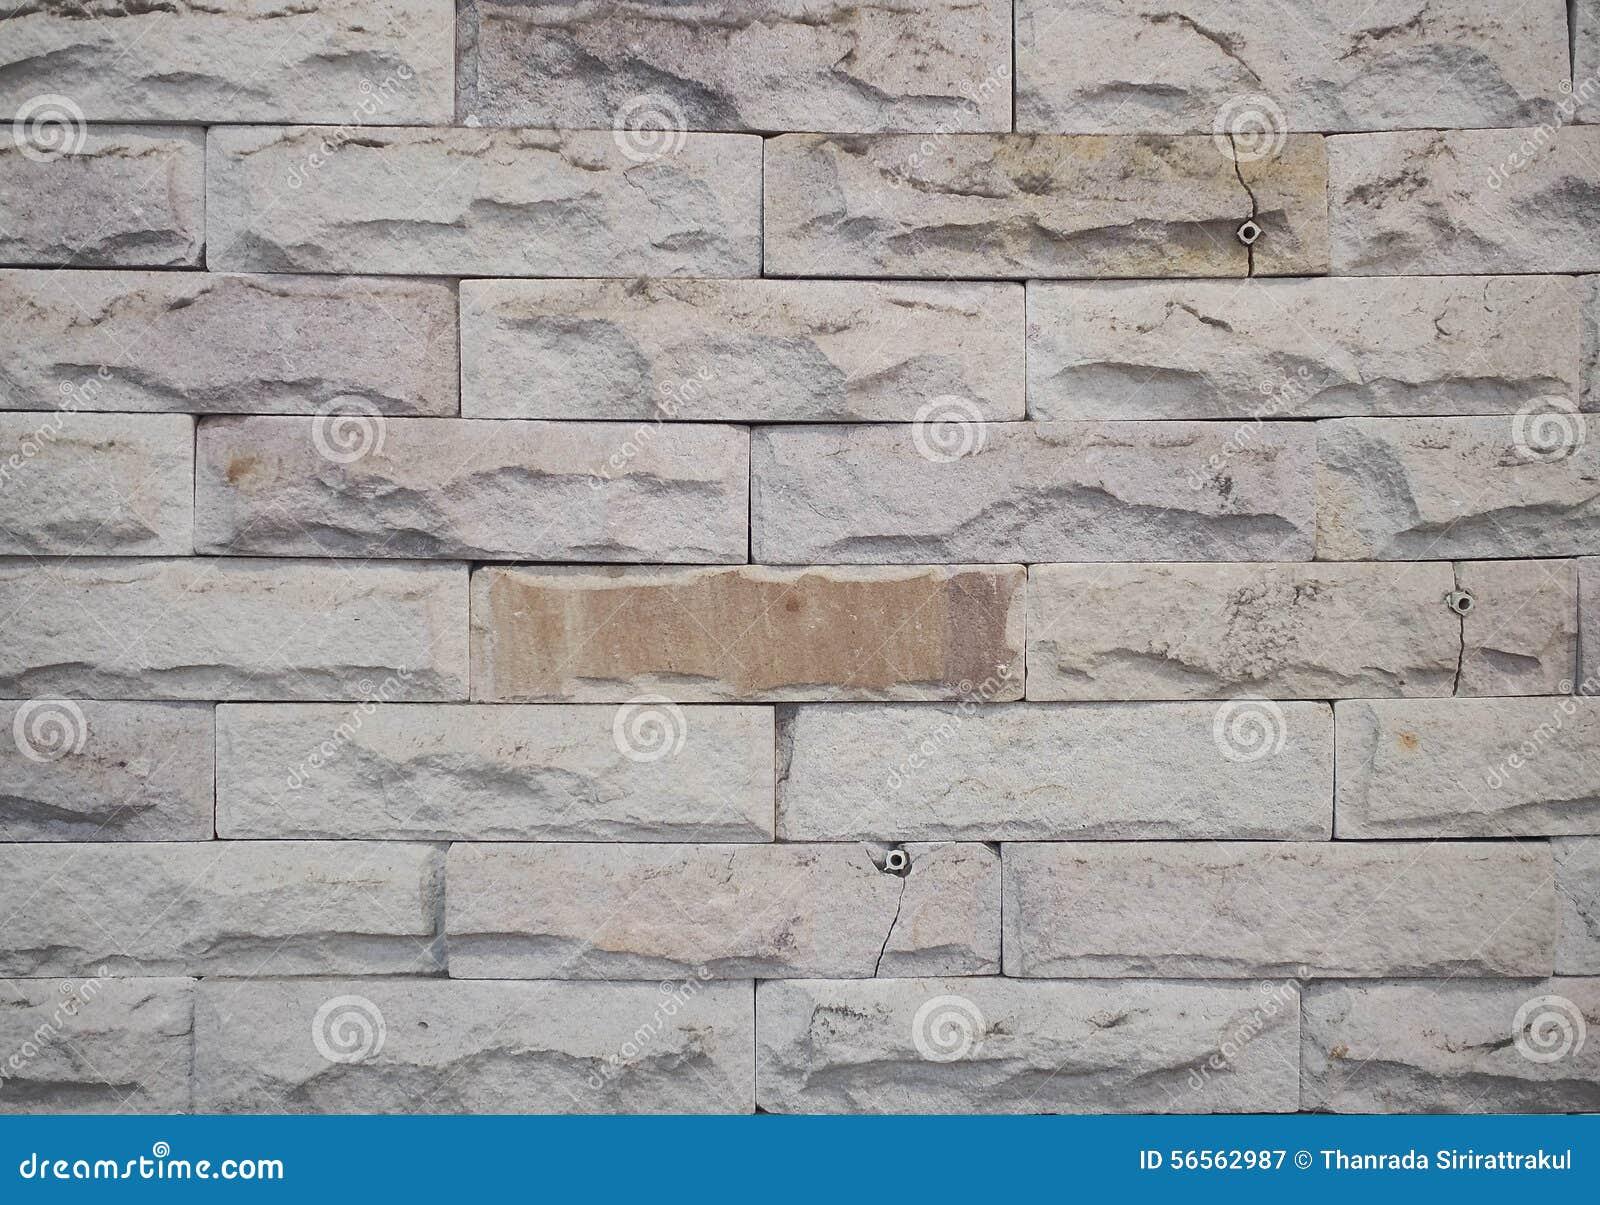 Download Ταπετσαρία του ακατέργαστου σχεδίου κεραμιδιών τούβλου Στοκ Εικόνα - εικόνα από συνθέστε, σύνθεση: 56562987